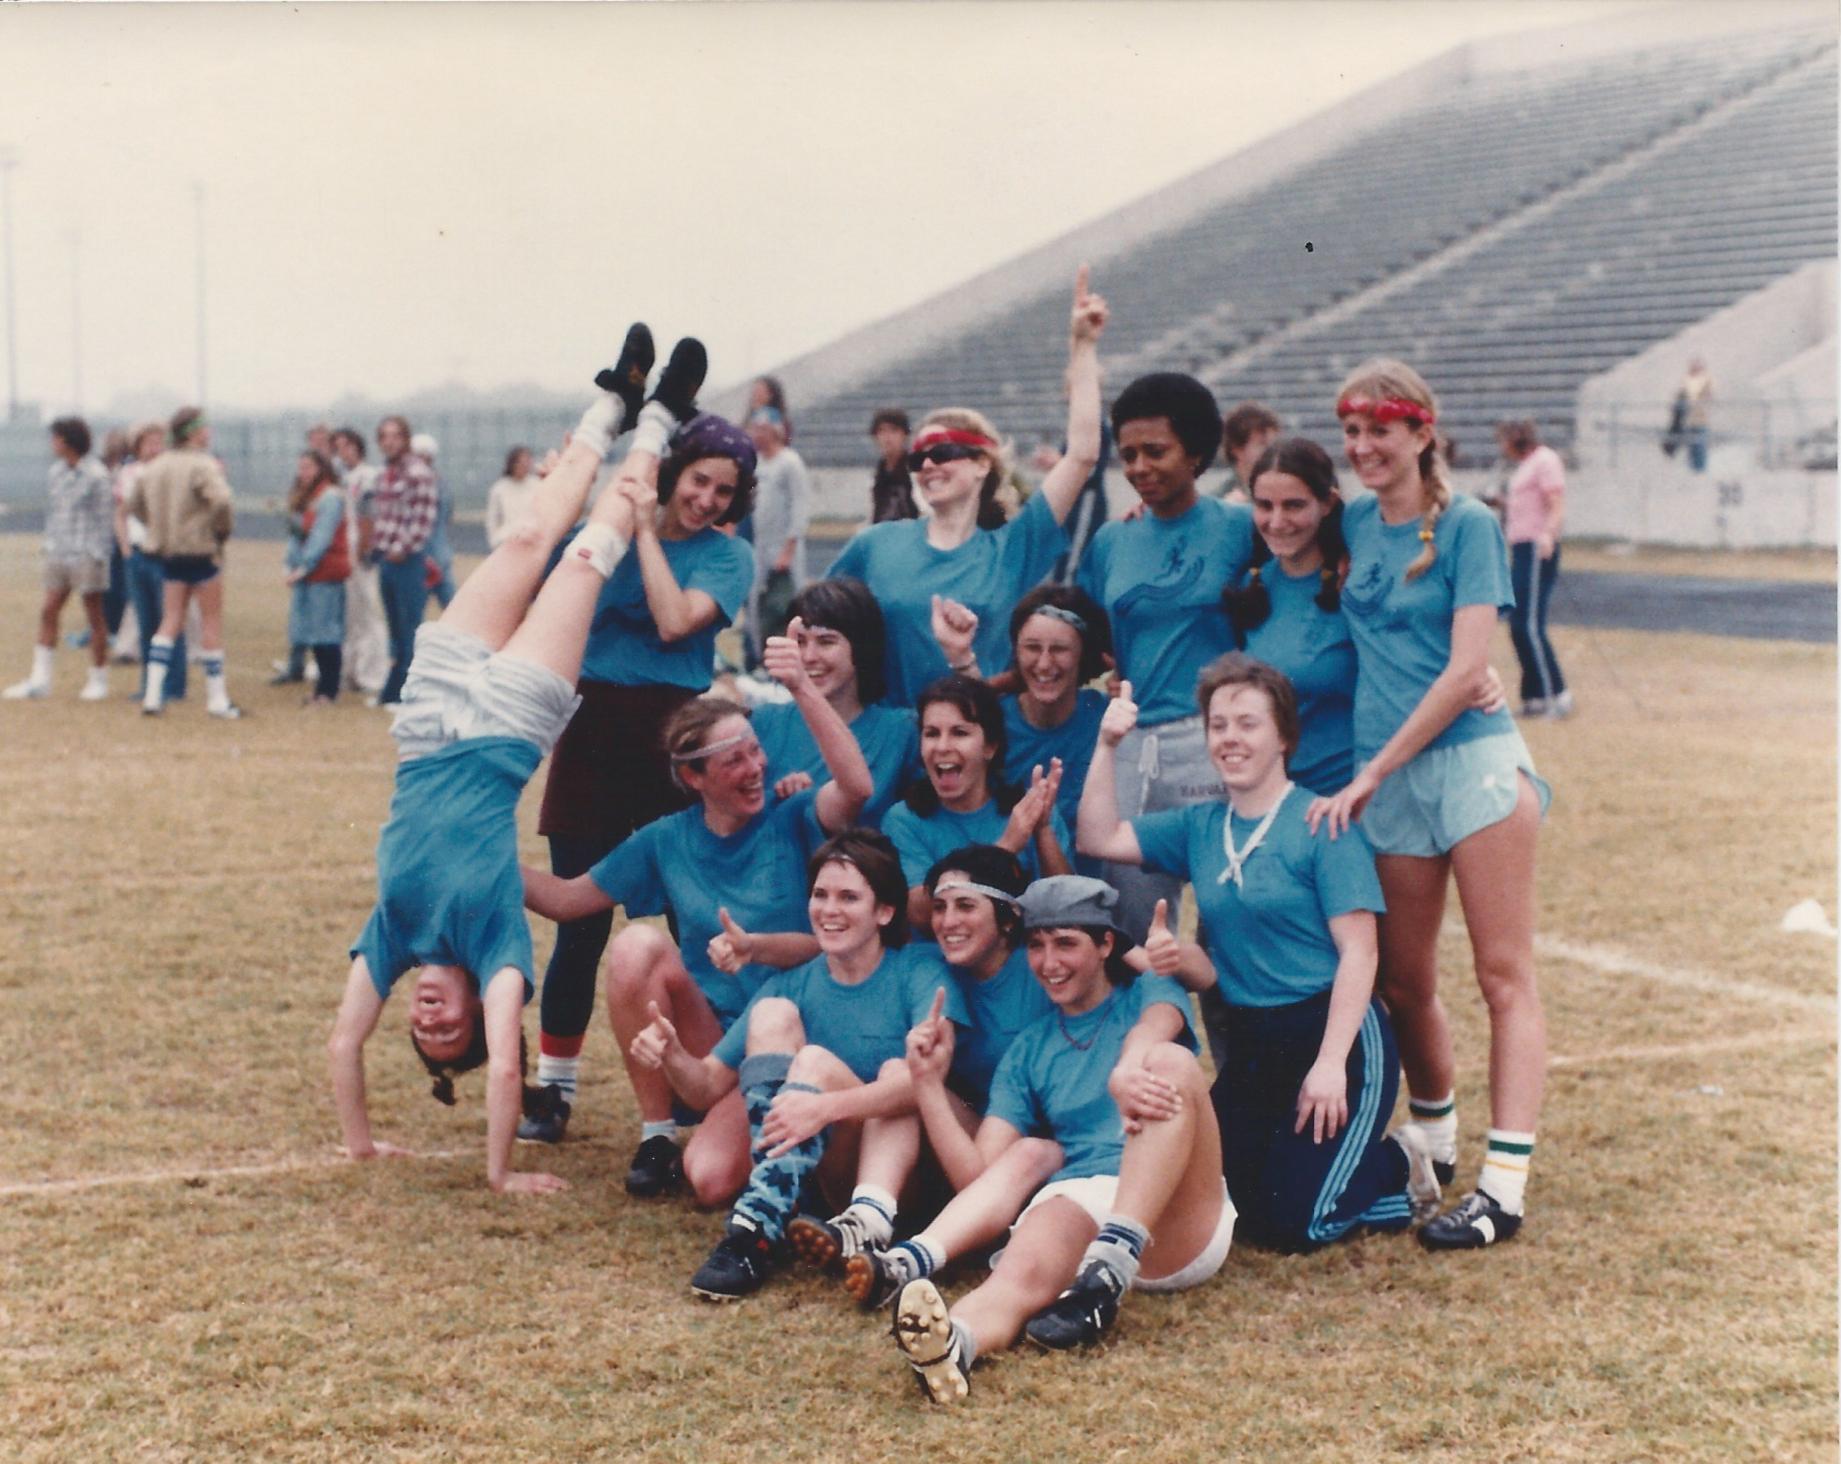 BLU (Boston Ladies Ultimate) winning National Championship in NOLA 1981